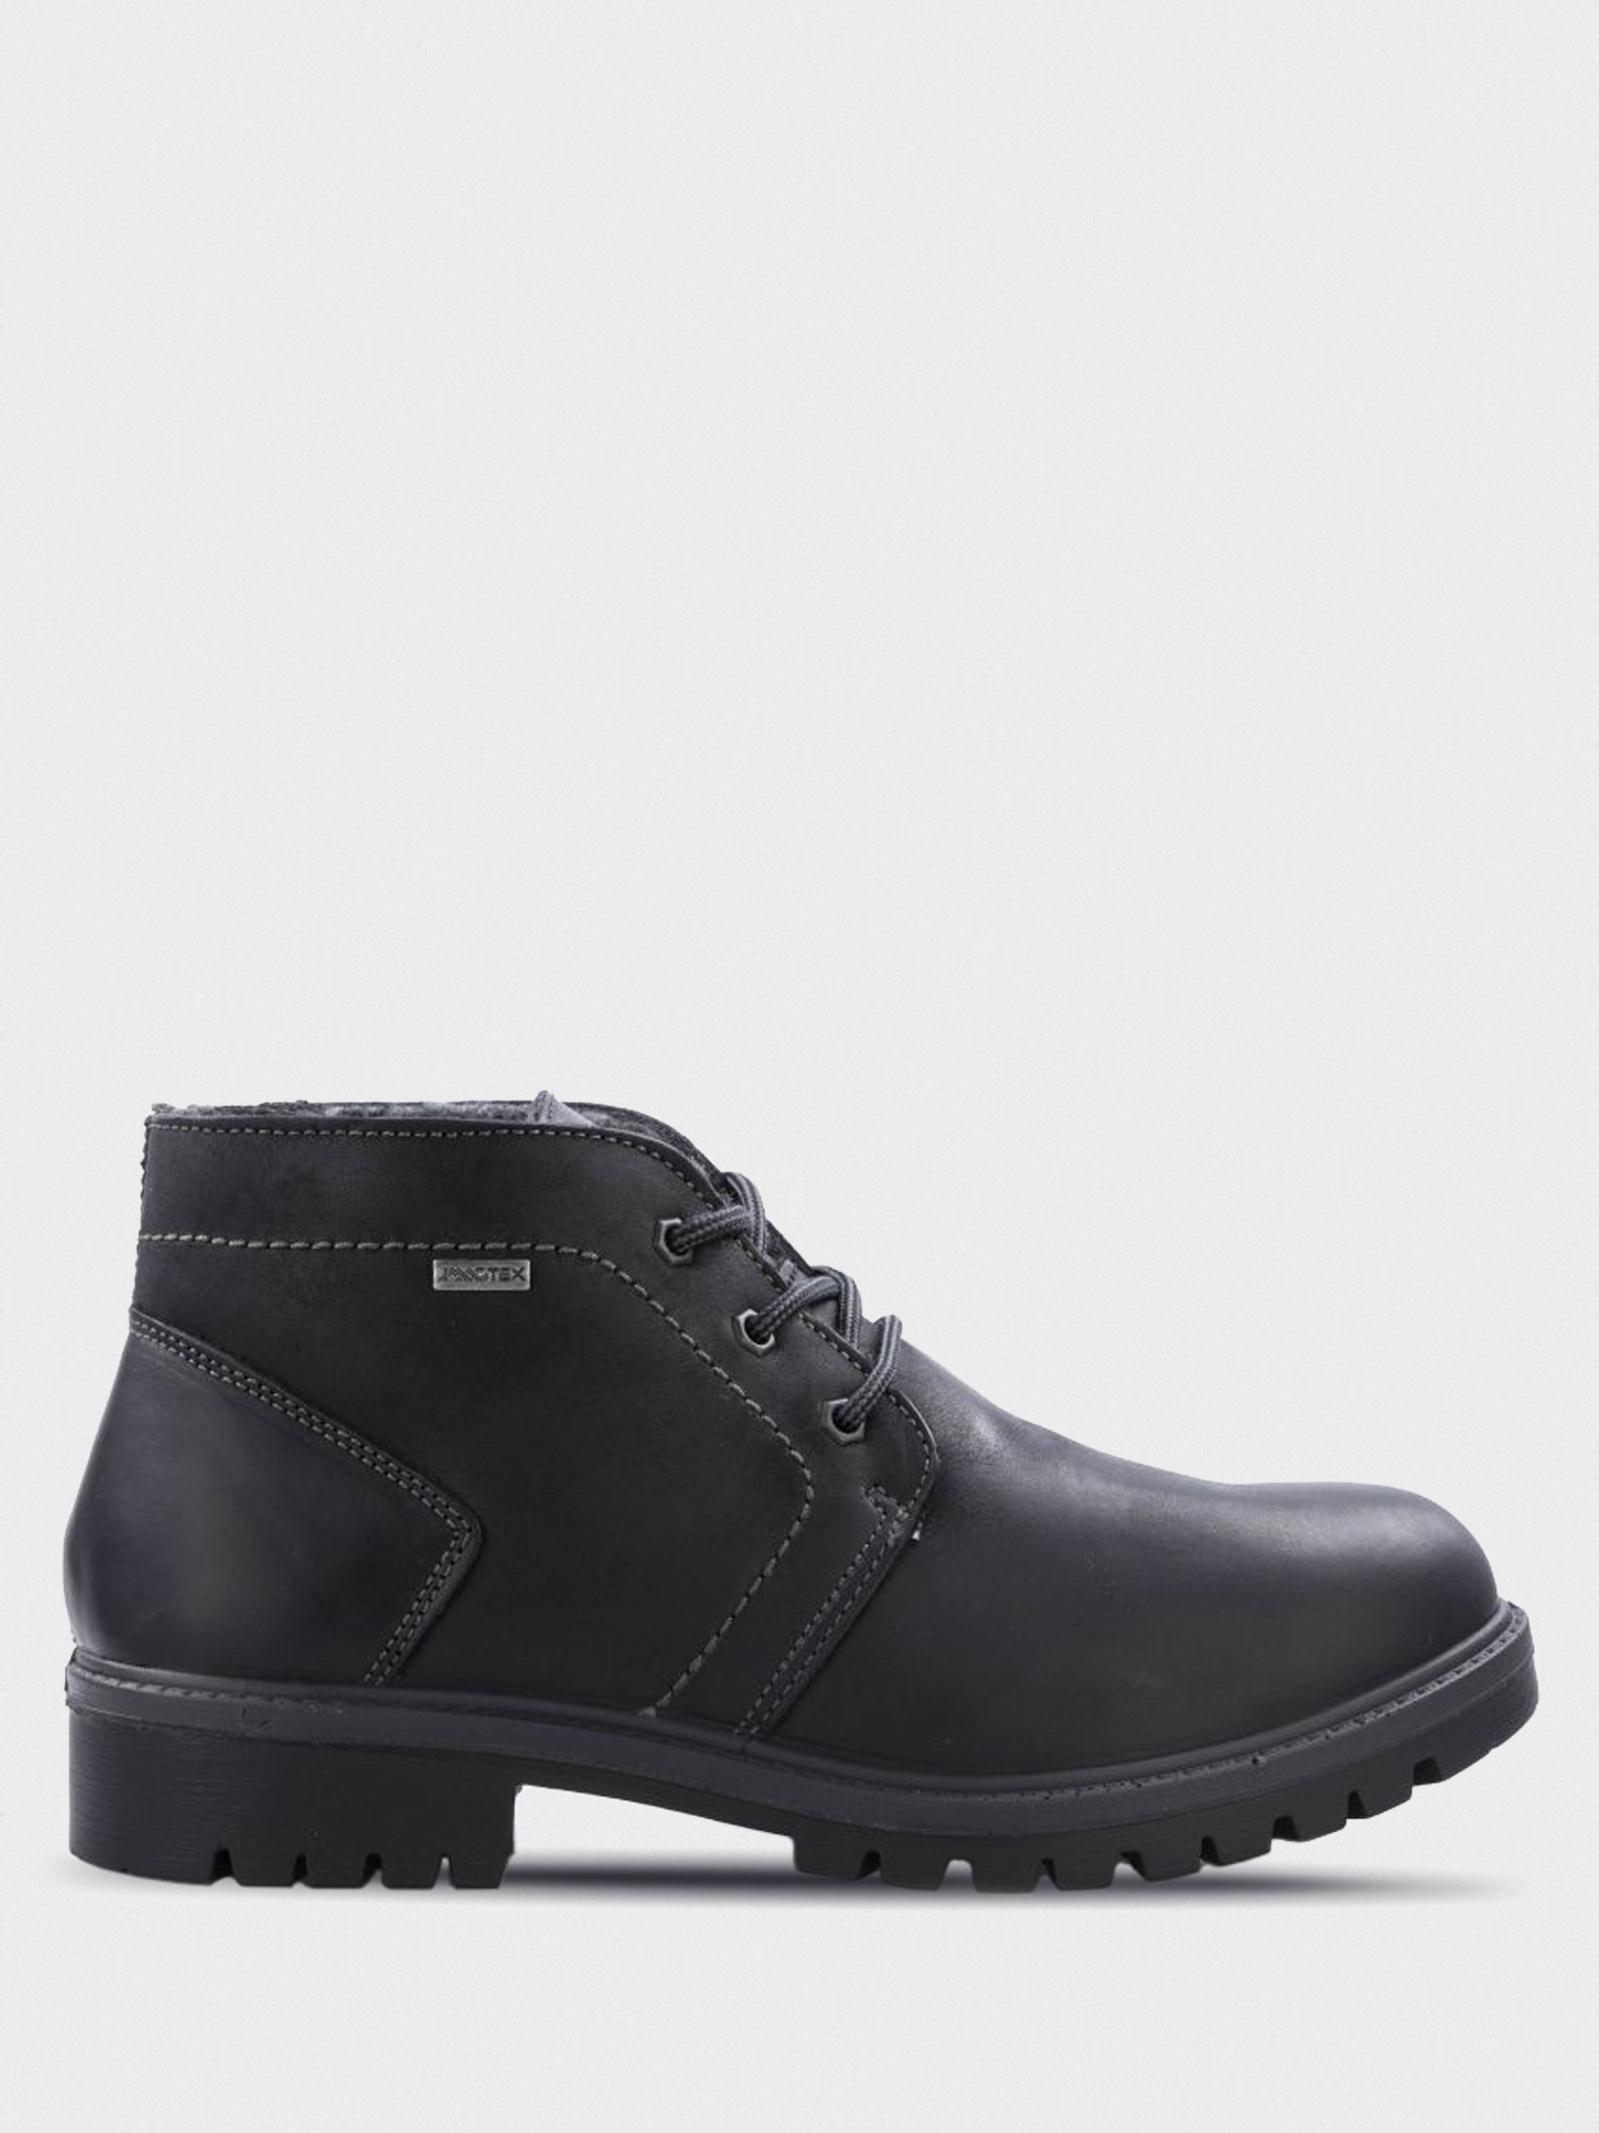 Ботинки для мужчин IMAC TIBET YH91 купить в Интертоп, 2017